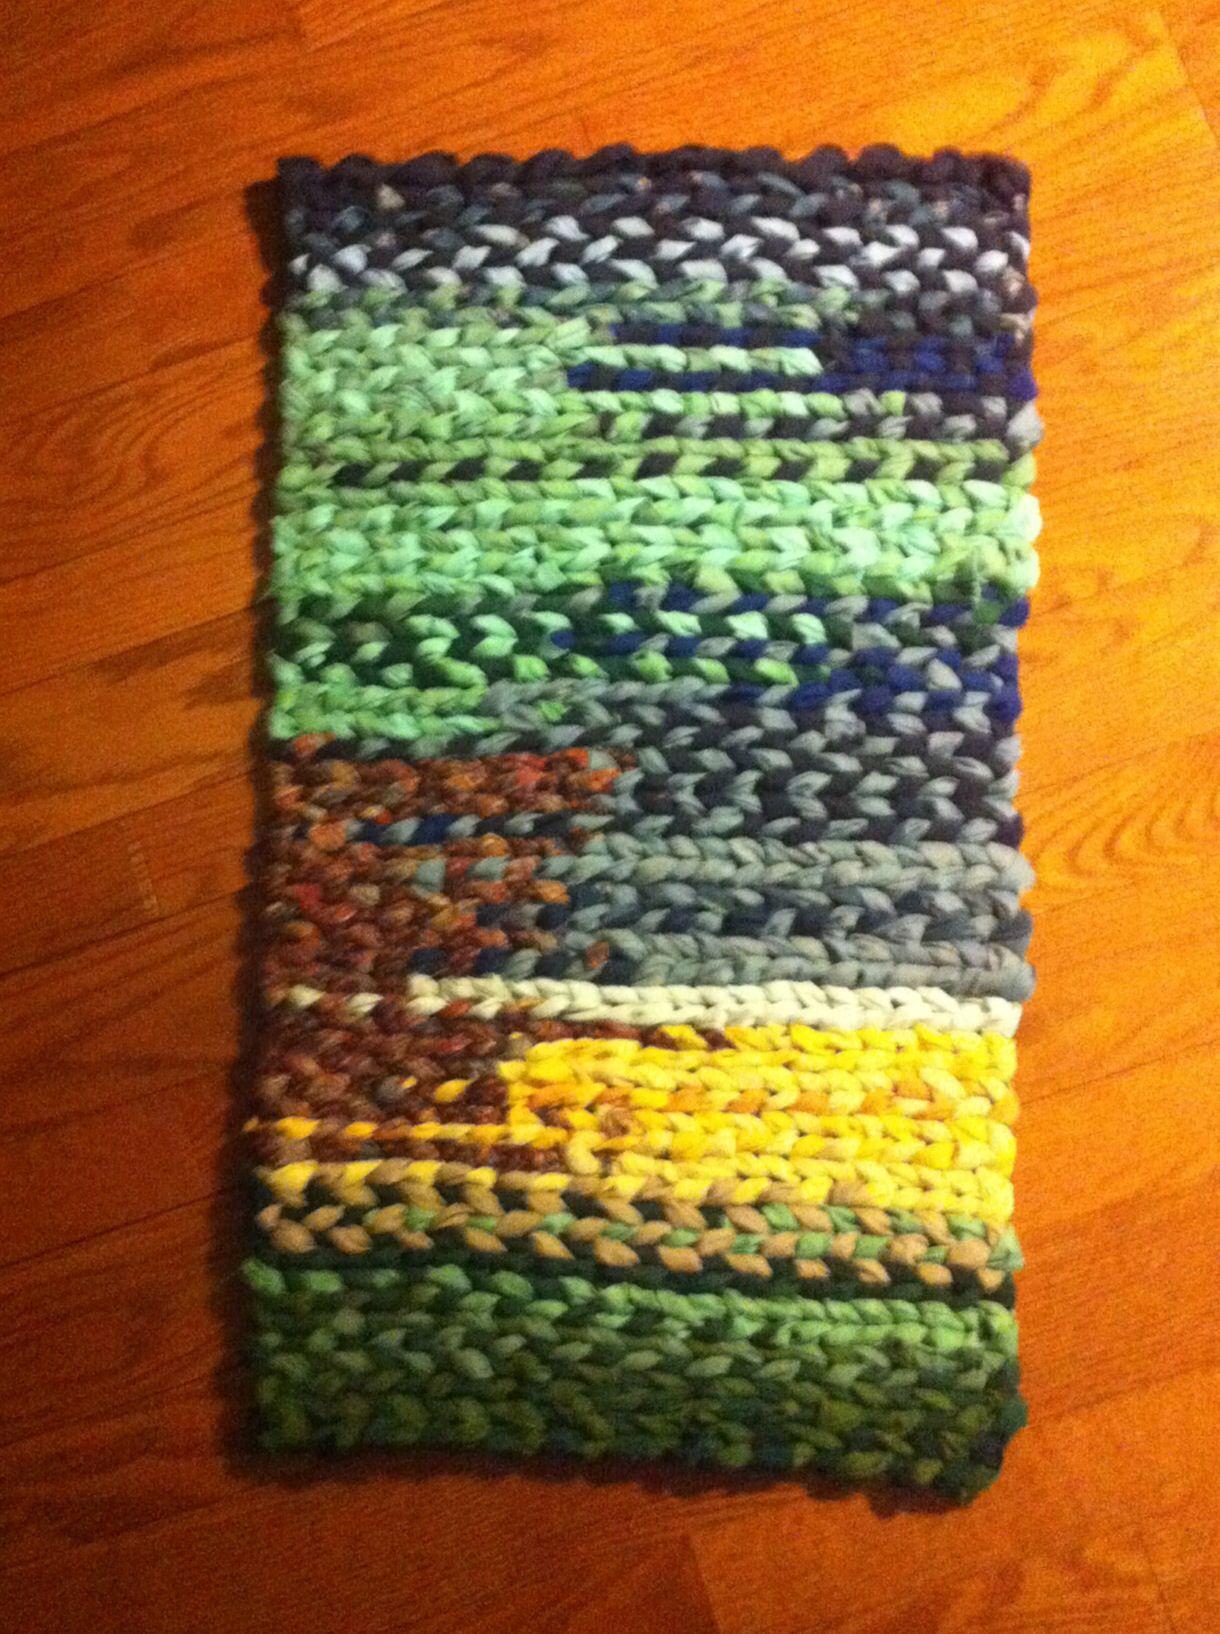 Rug woven on a Salish Loom by Ilene | Weaving | Pinterest